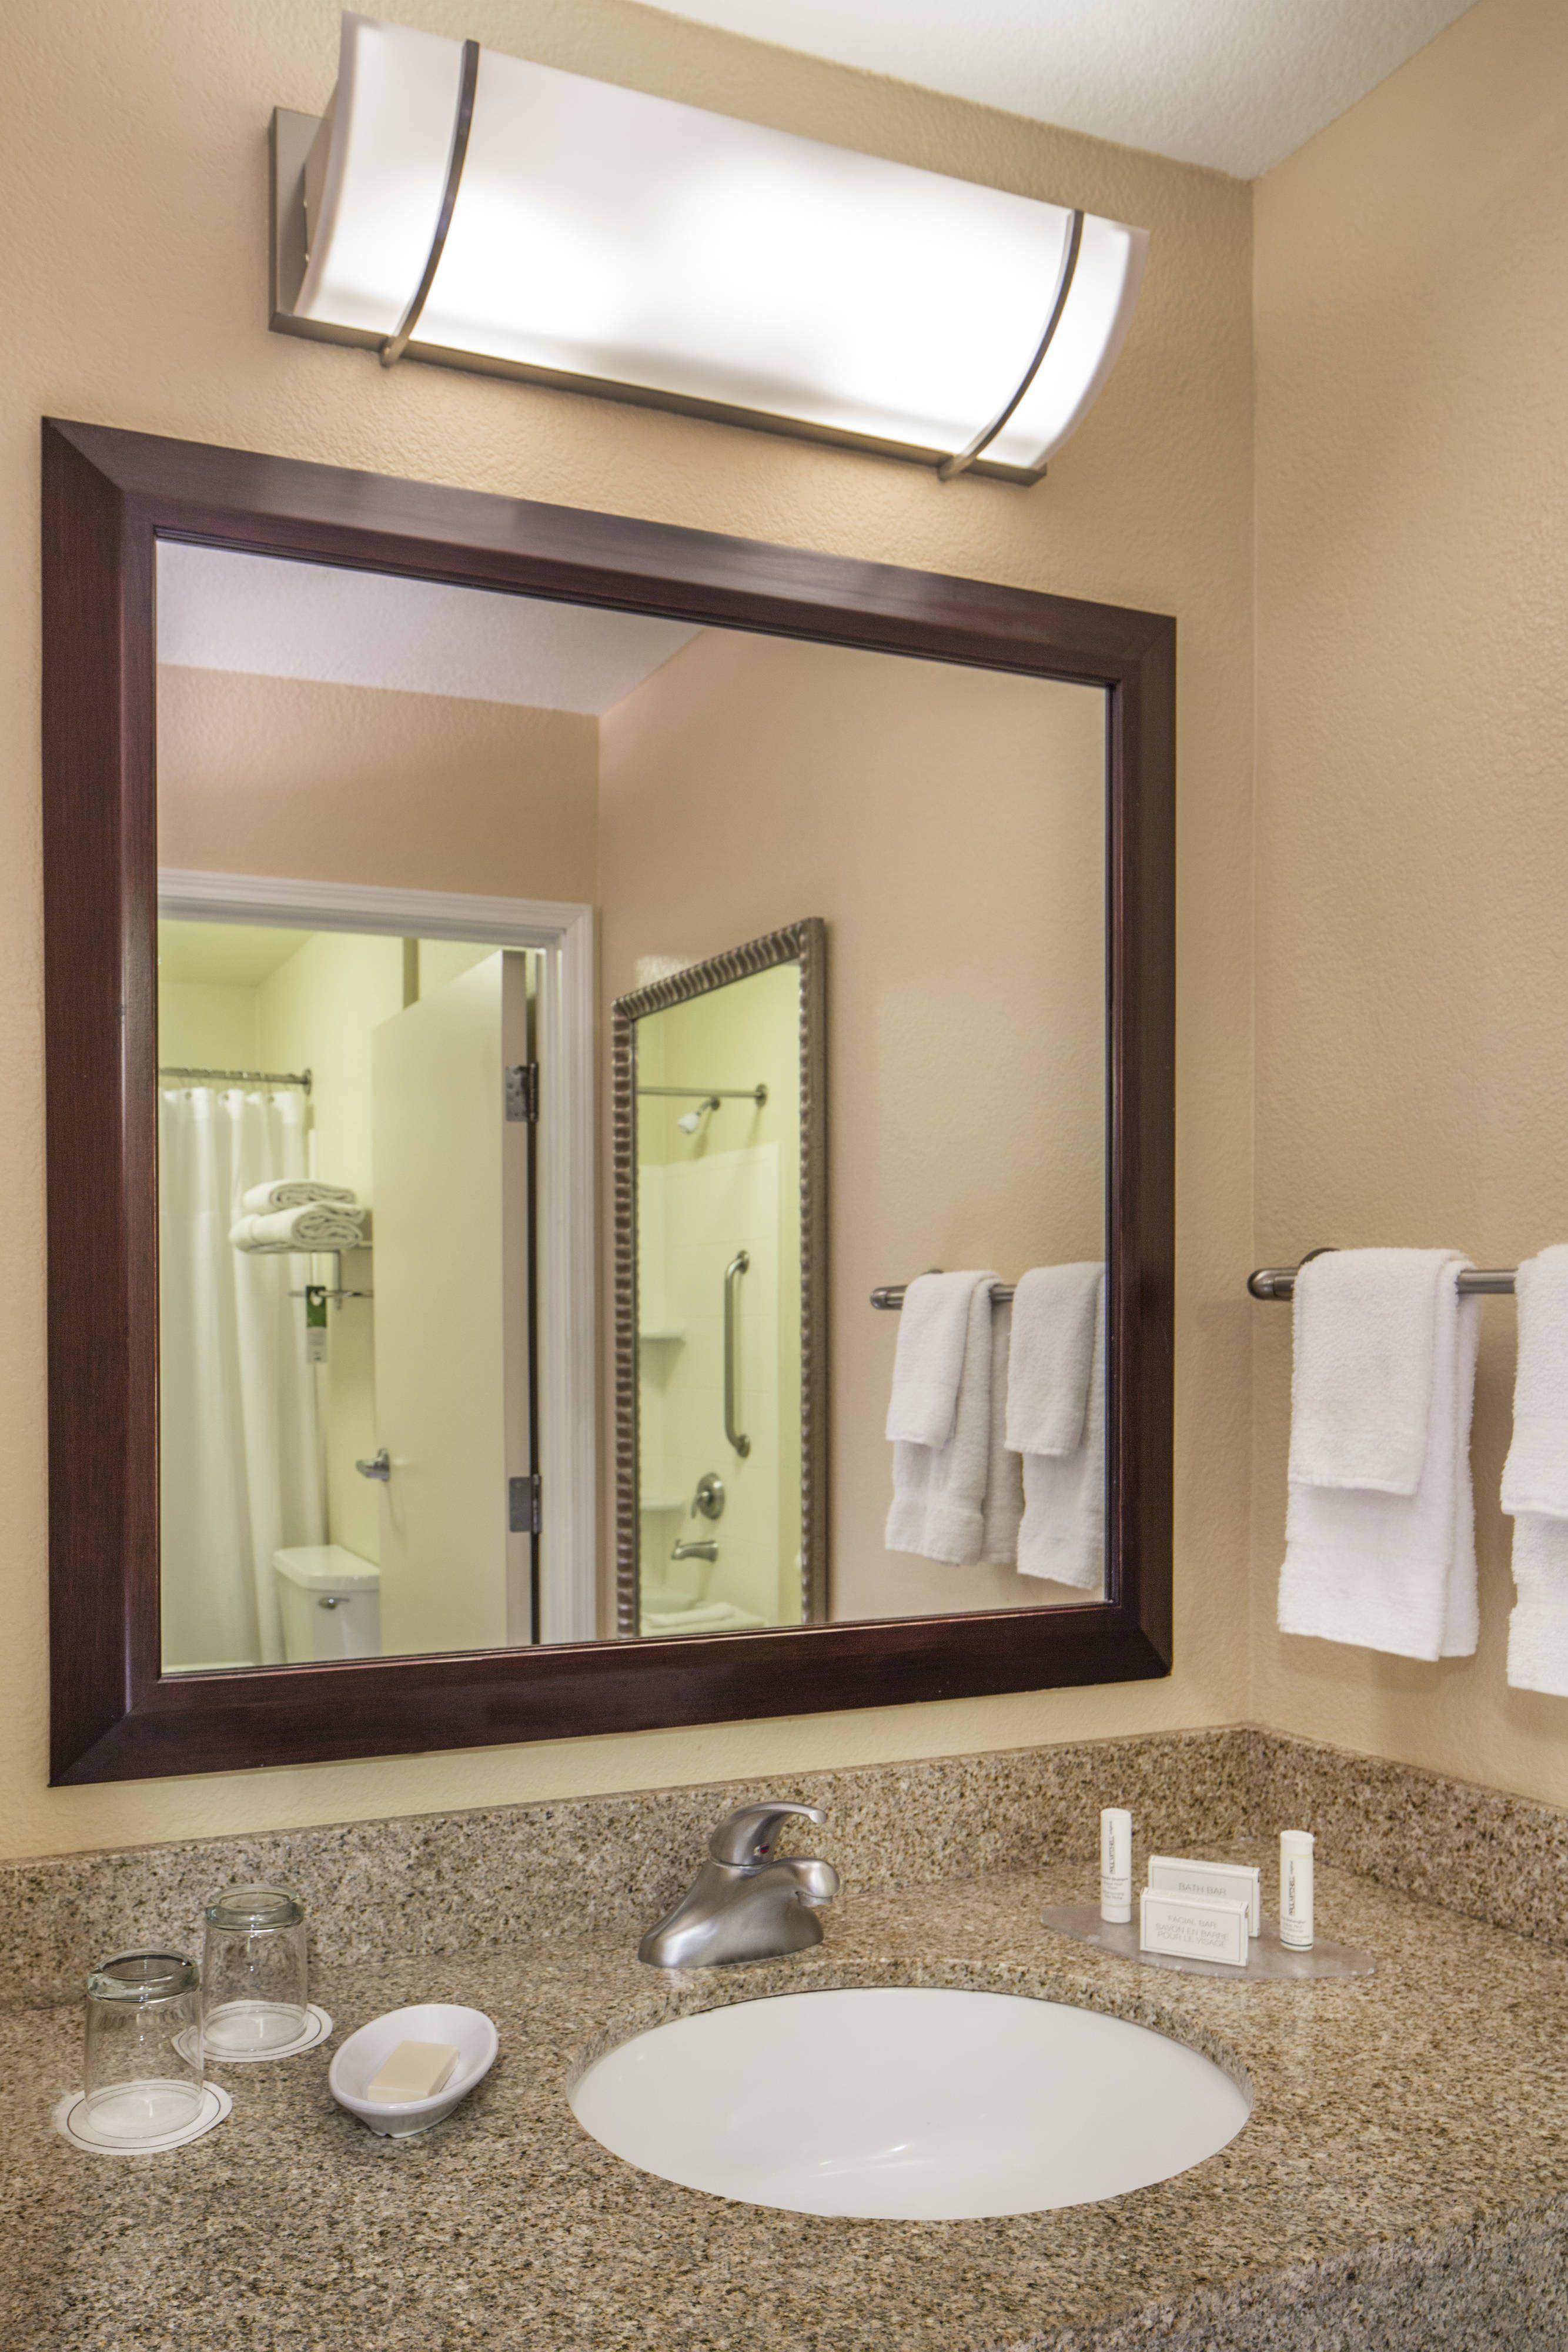 Springhill Suites Laredo Guest Bathroom Vanity Relax Travel